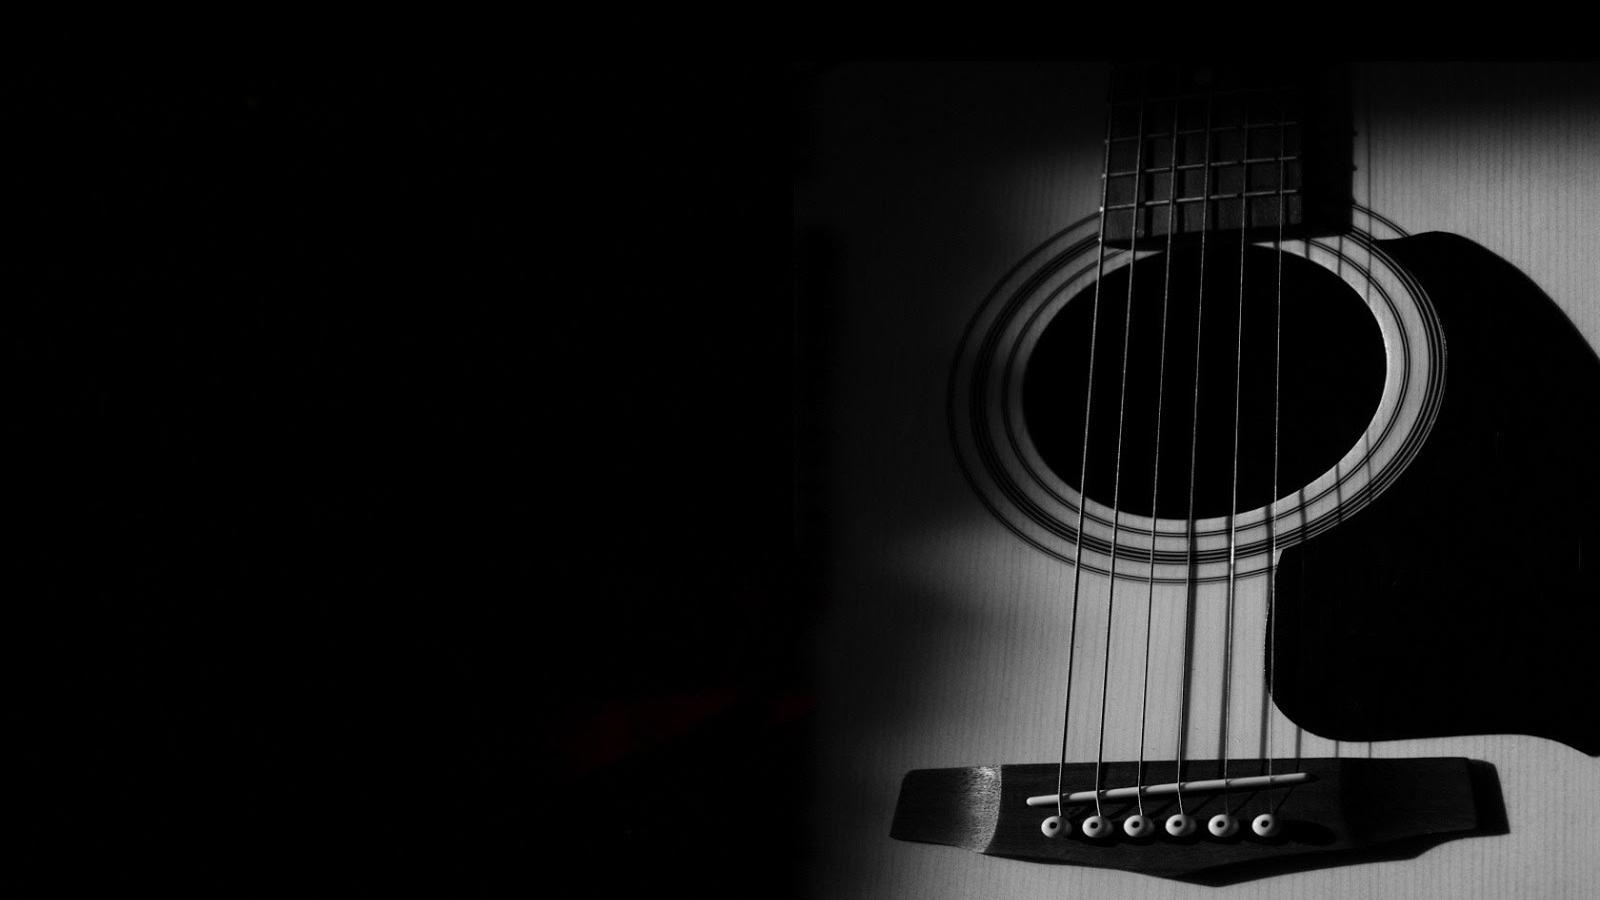 Free Download Guitar Hd Wallpapers 1600x1000 For Your Desktop Mobile Tablet Explore 76 Hd Guitar Wallpaper Acoustic Guitar Wallpaper Hd Guitar Wallpapers 1920x1080 Widescreen Guitar Background Wallpaper